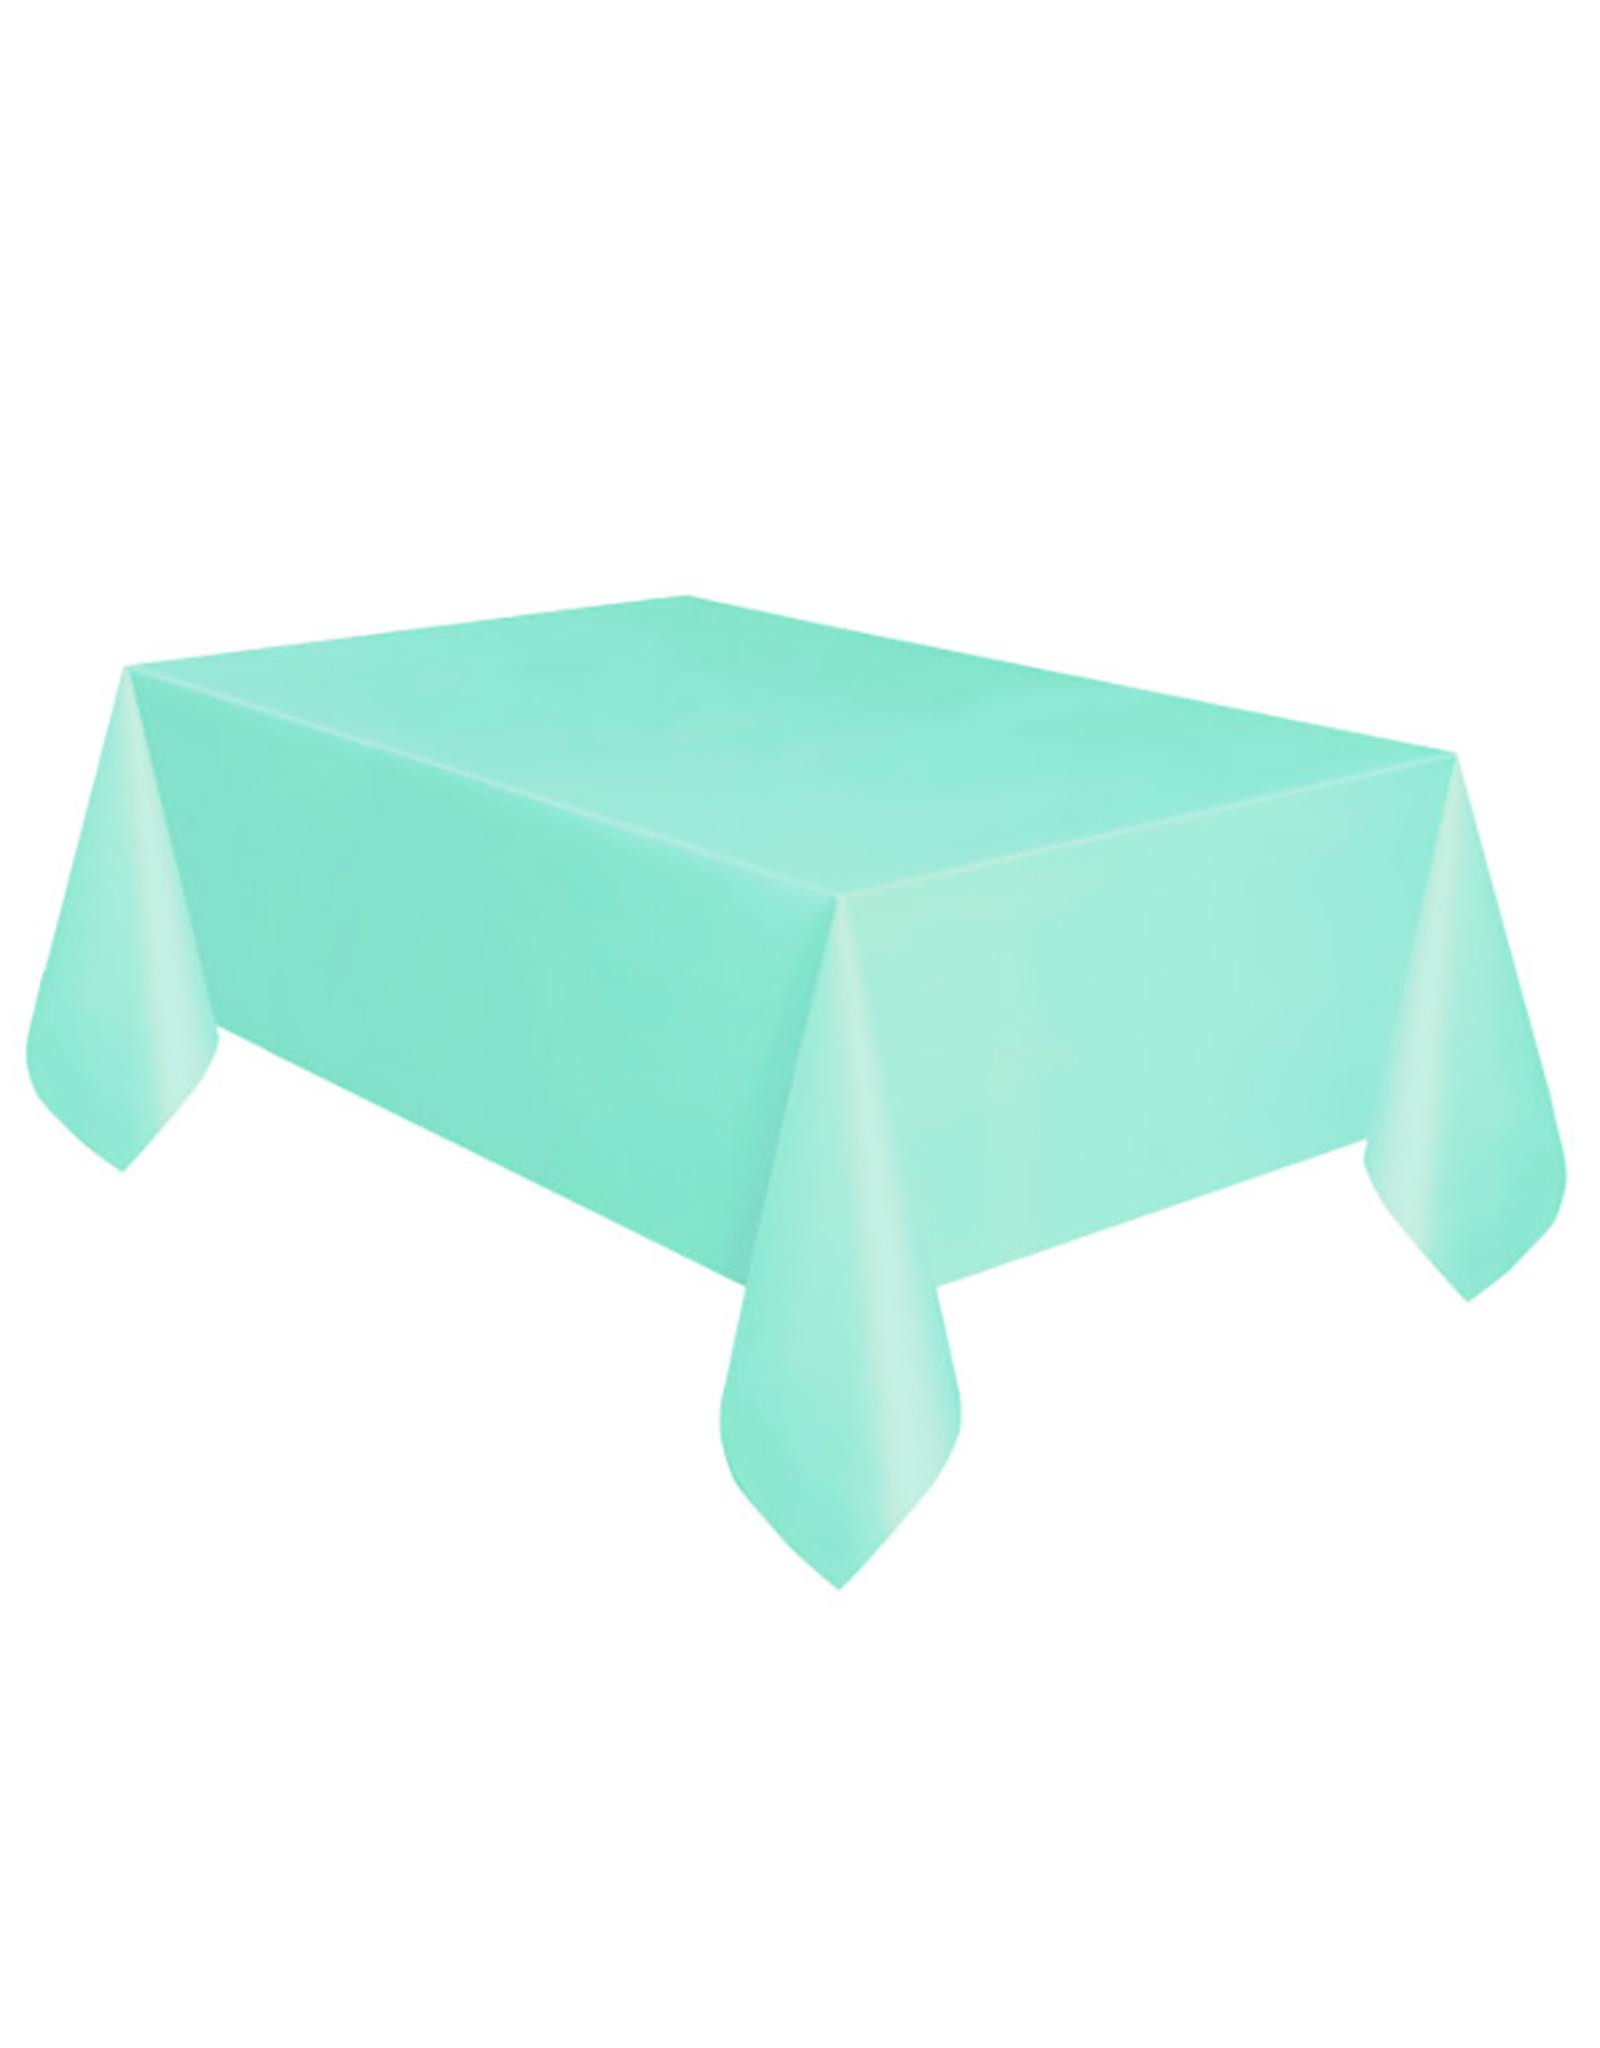 HAZA Plastic tafelkleed mintgroen | 137 x 274 cm